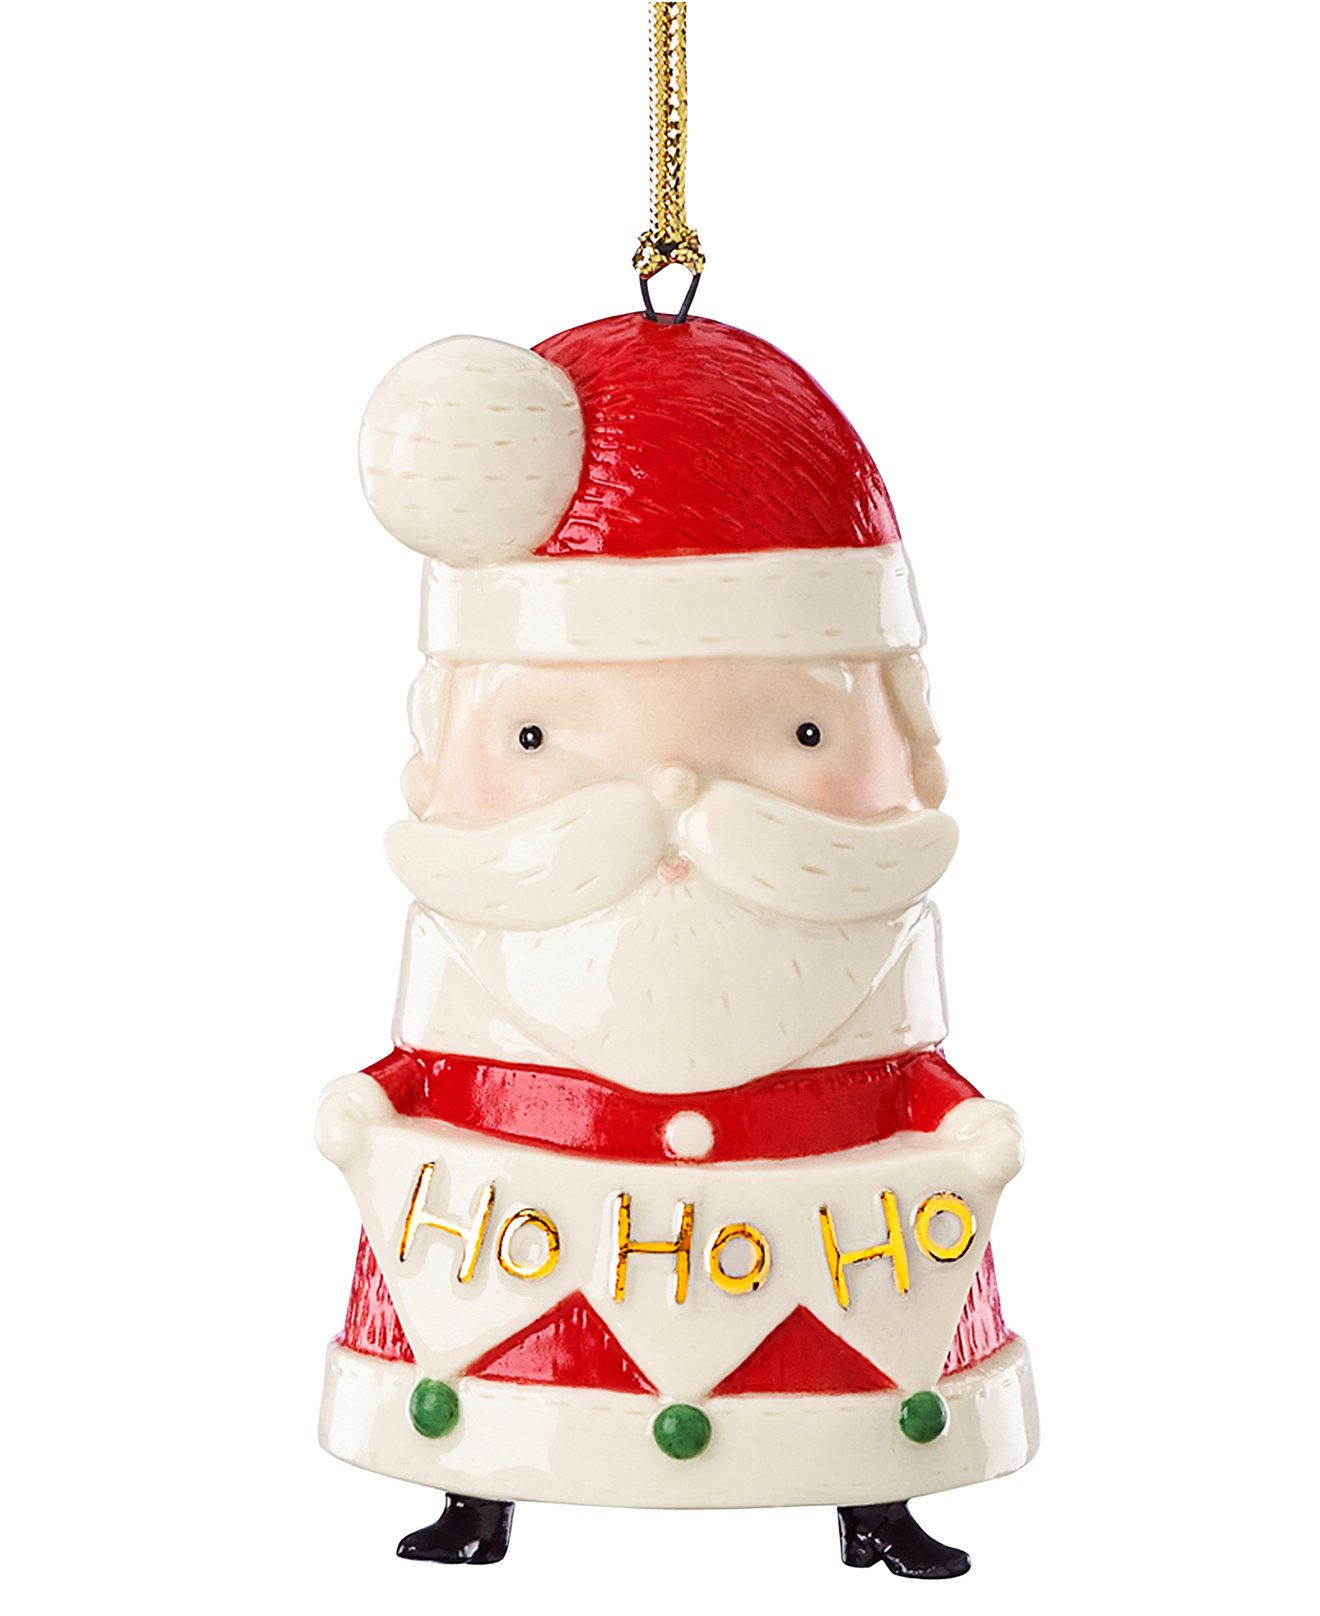 Lenox Festive Friends Santa Ornament - Holiday Lane - For The Home ...